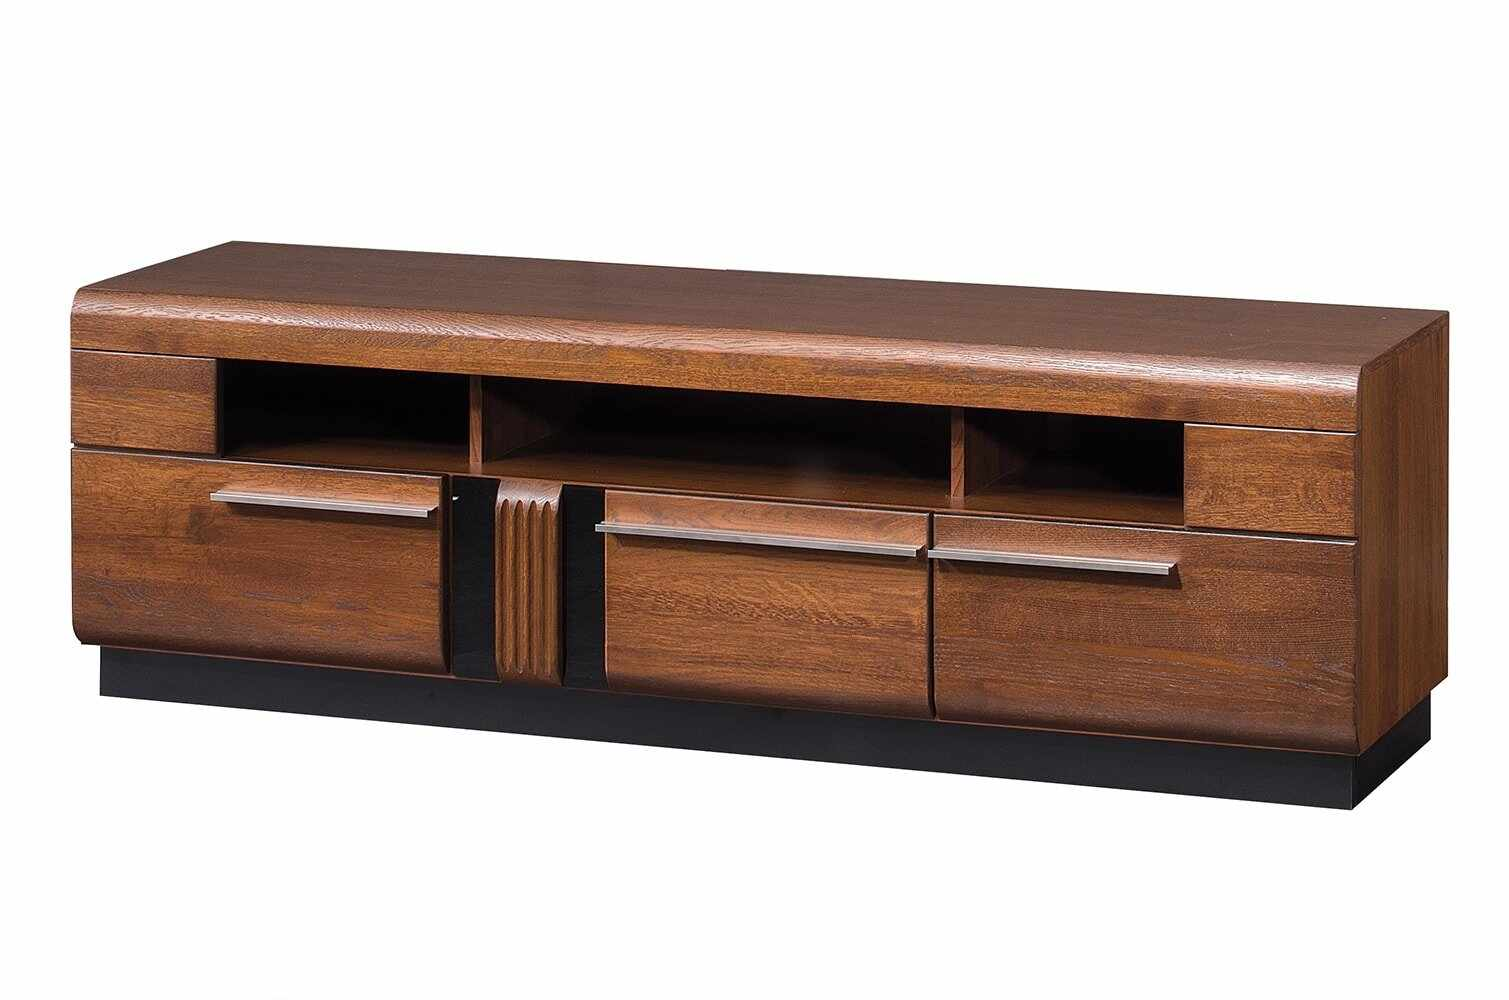 Comoda TV din MDF si pal, cu 3 sertare Porti 25 Stejar Antic, l160xA42xH51 cm la pret 2077 lei